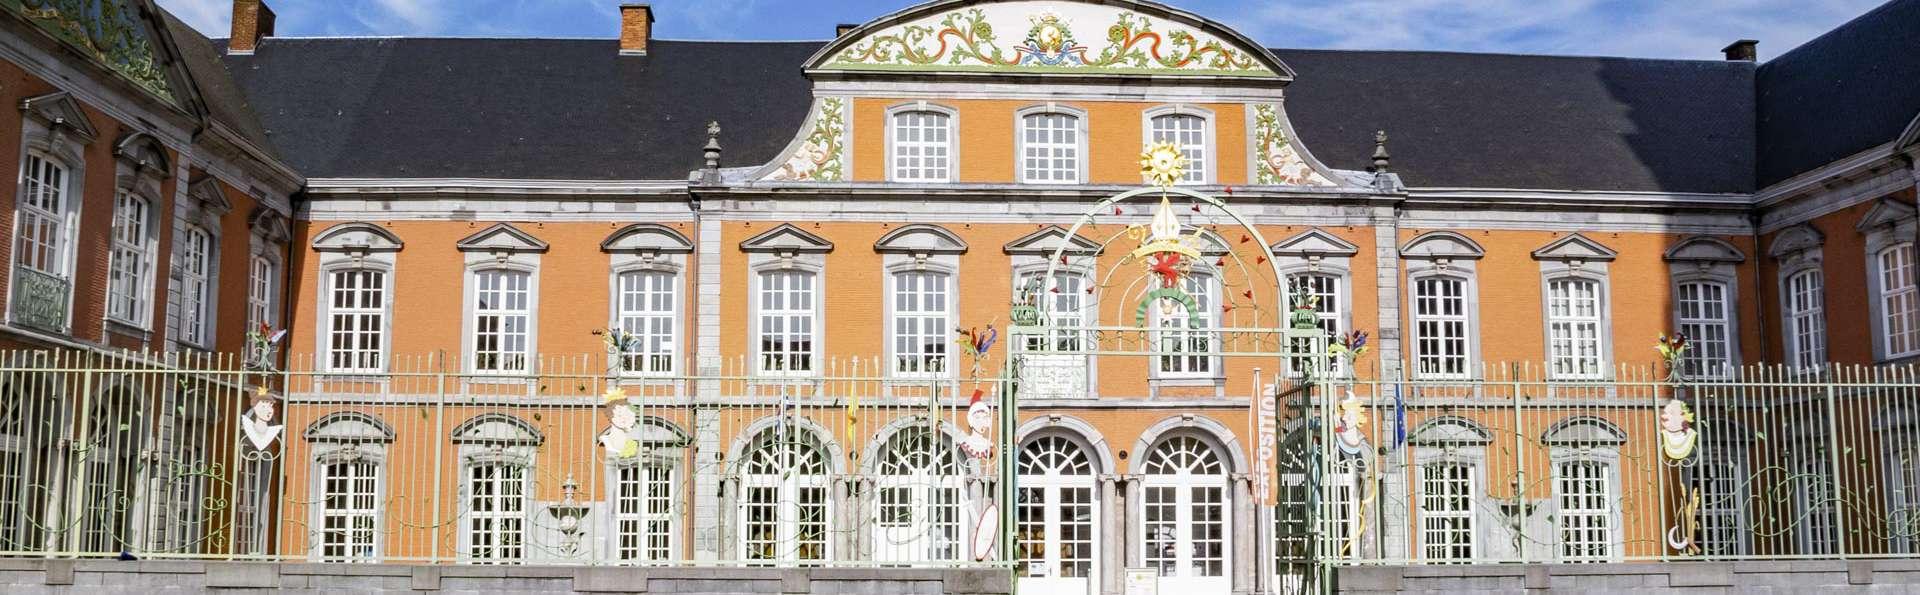 Hotel Le Saint-Hubert - EDIT_DESTINATION_01.jpg